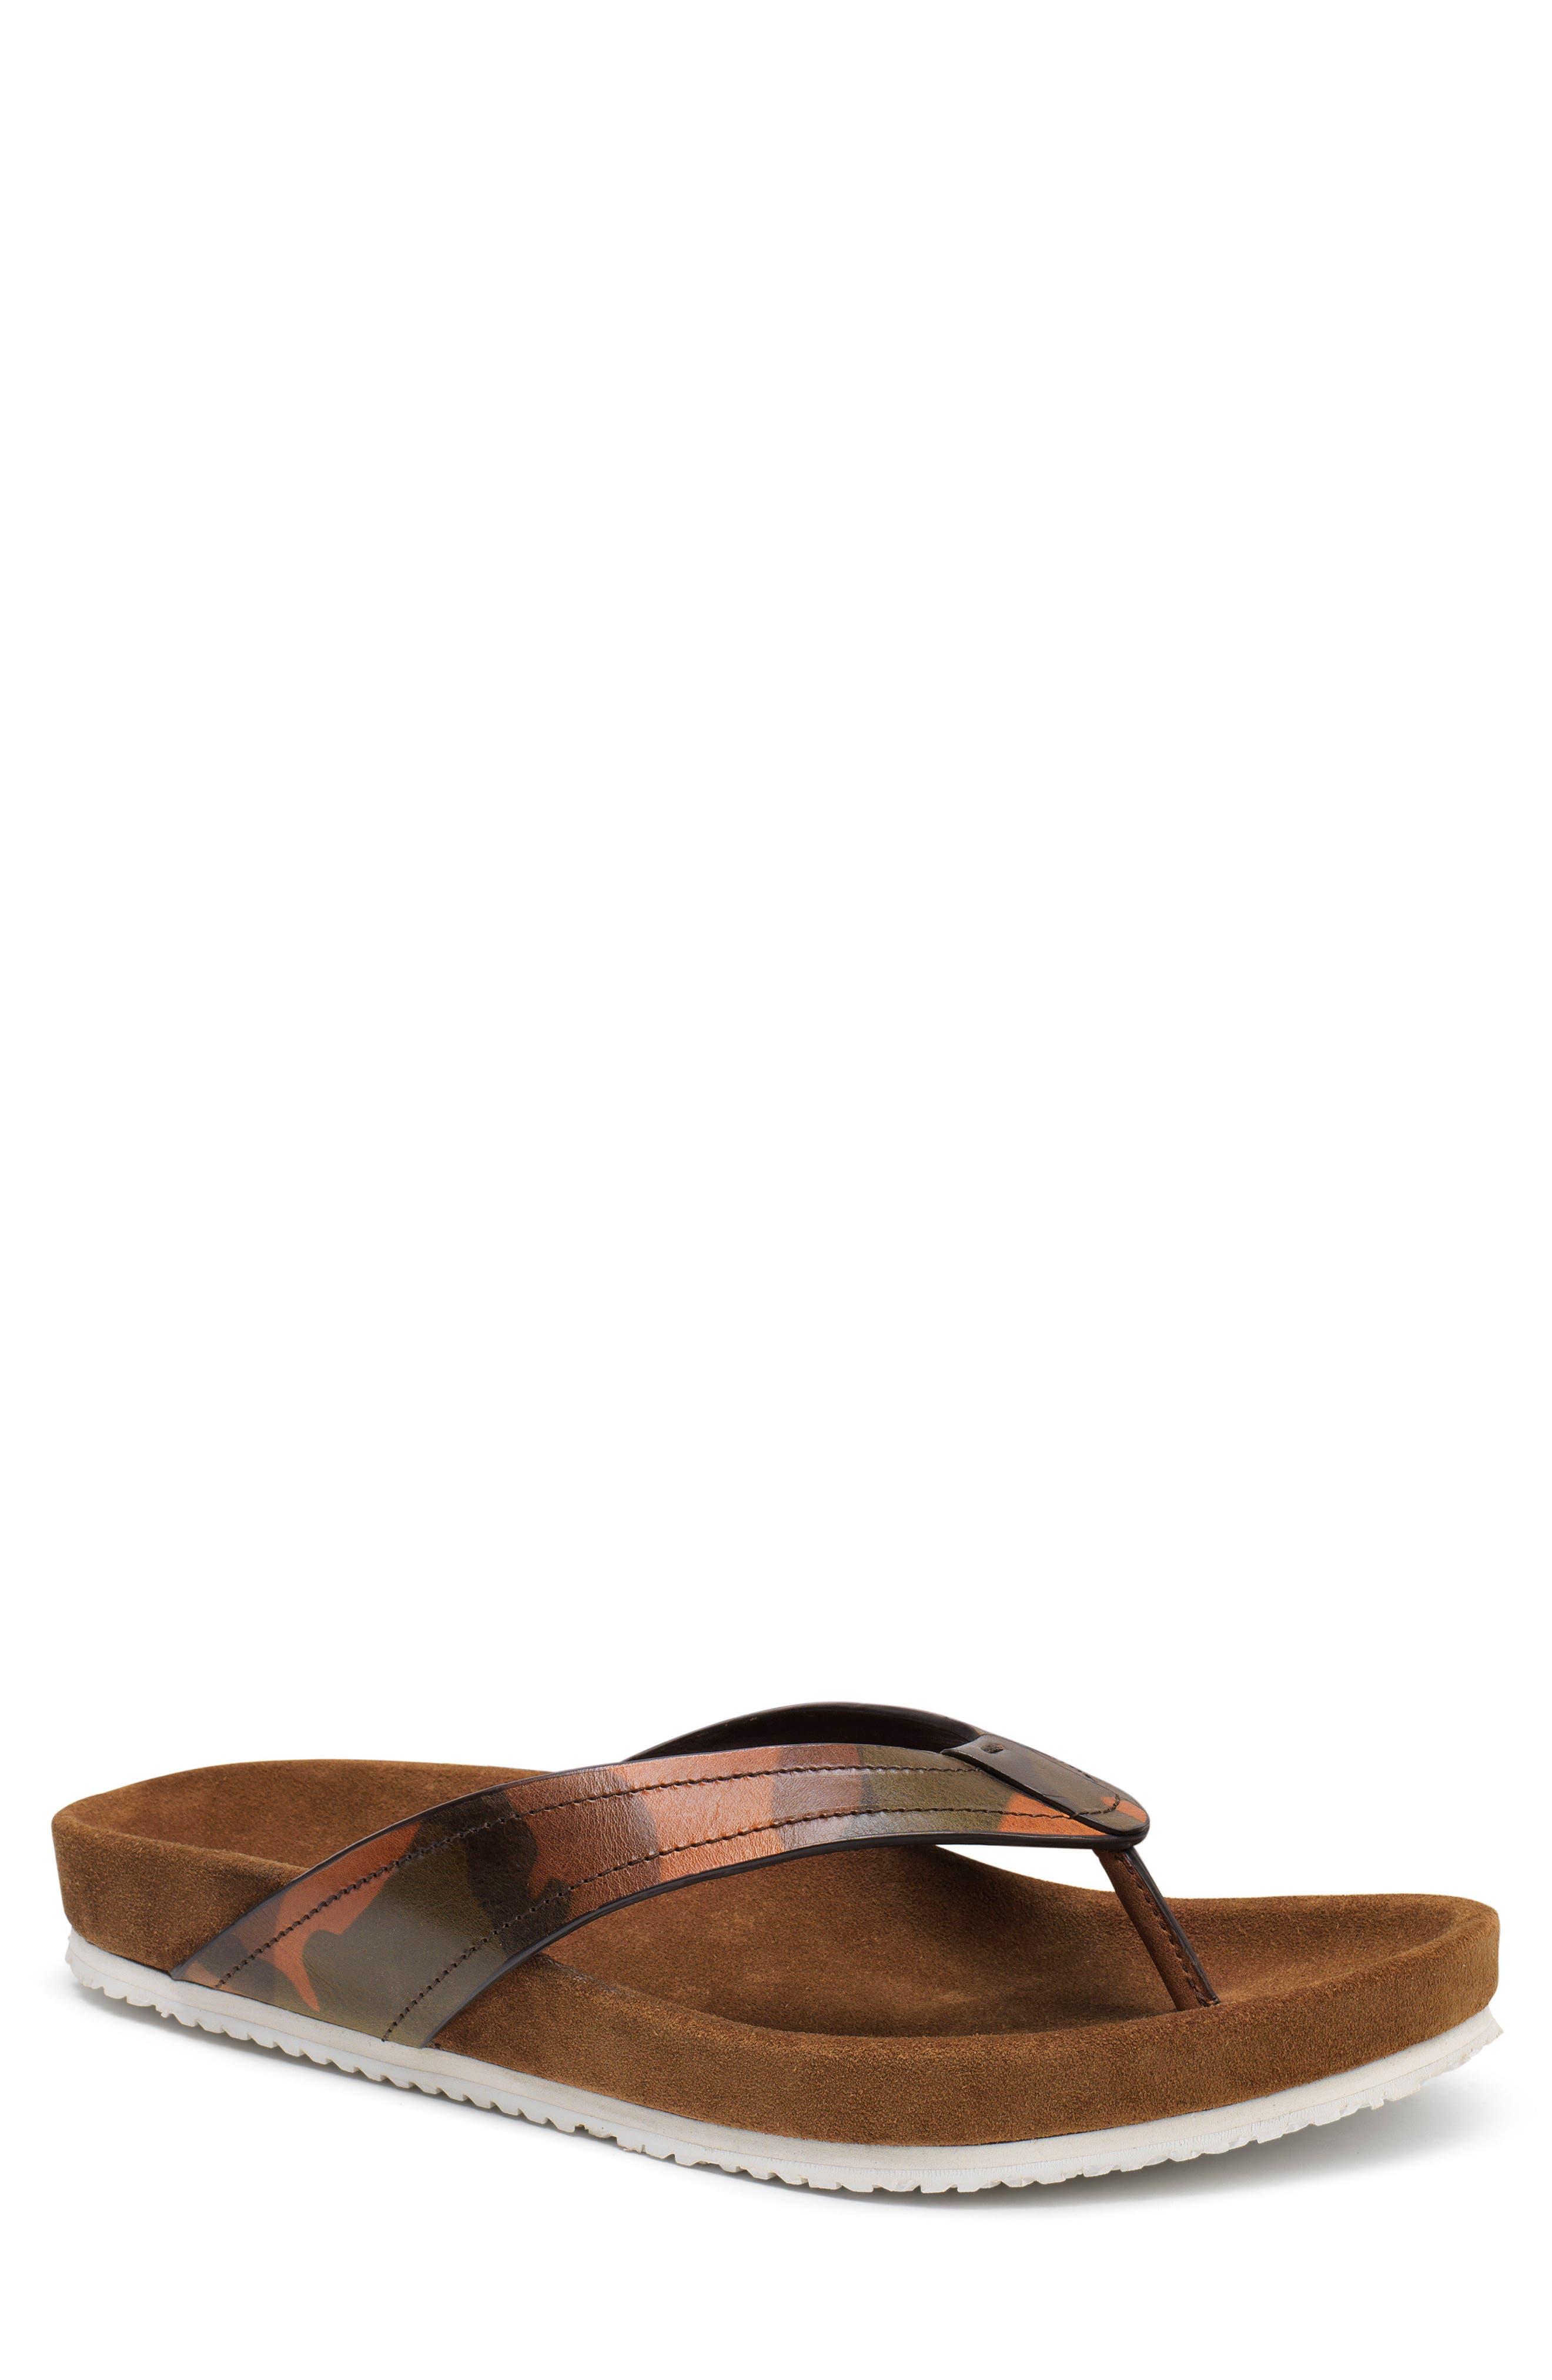 Fleming Flip Flop,                         Main,                         color, Camoflage Leather